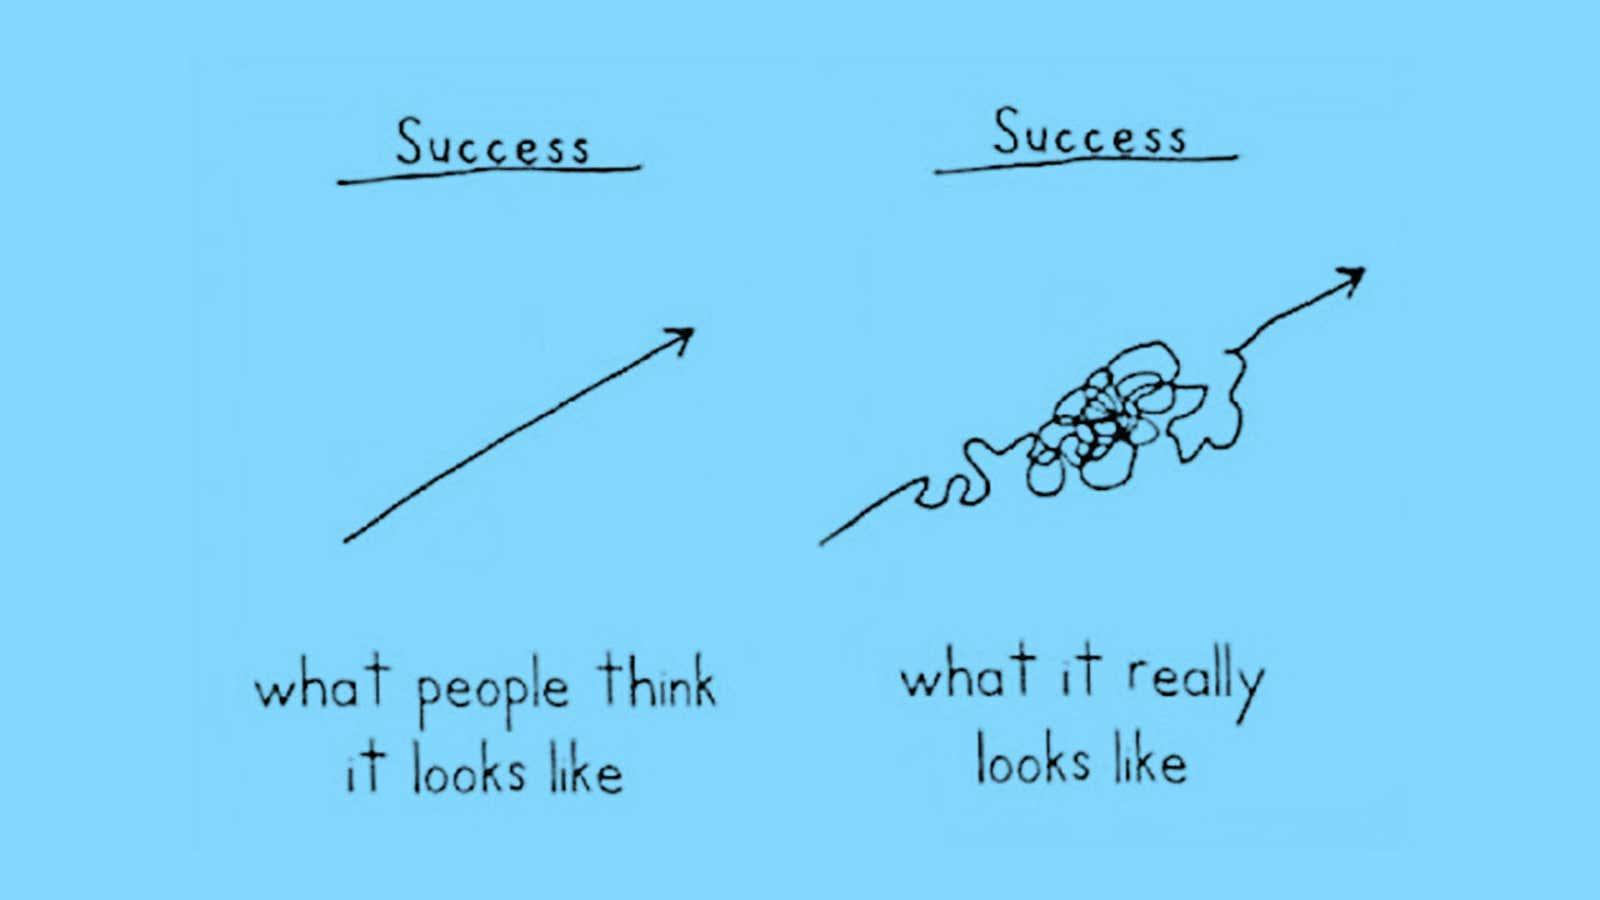 Demetri Martin: The Success Chart